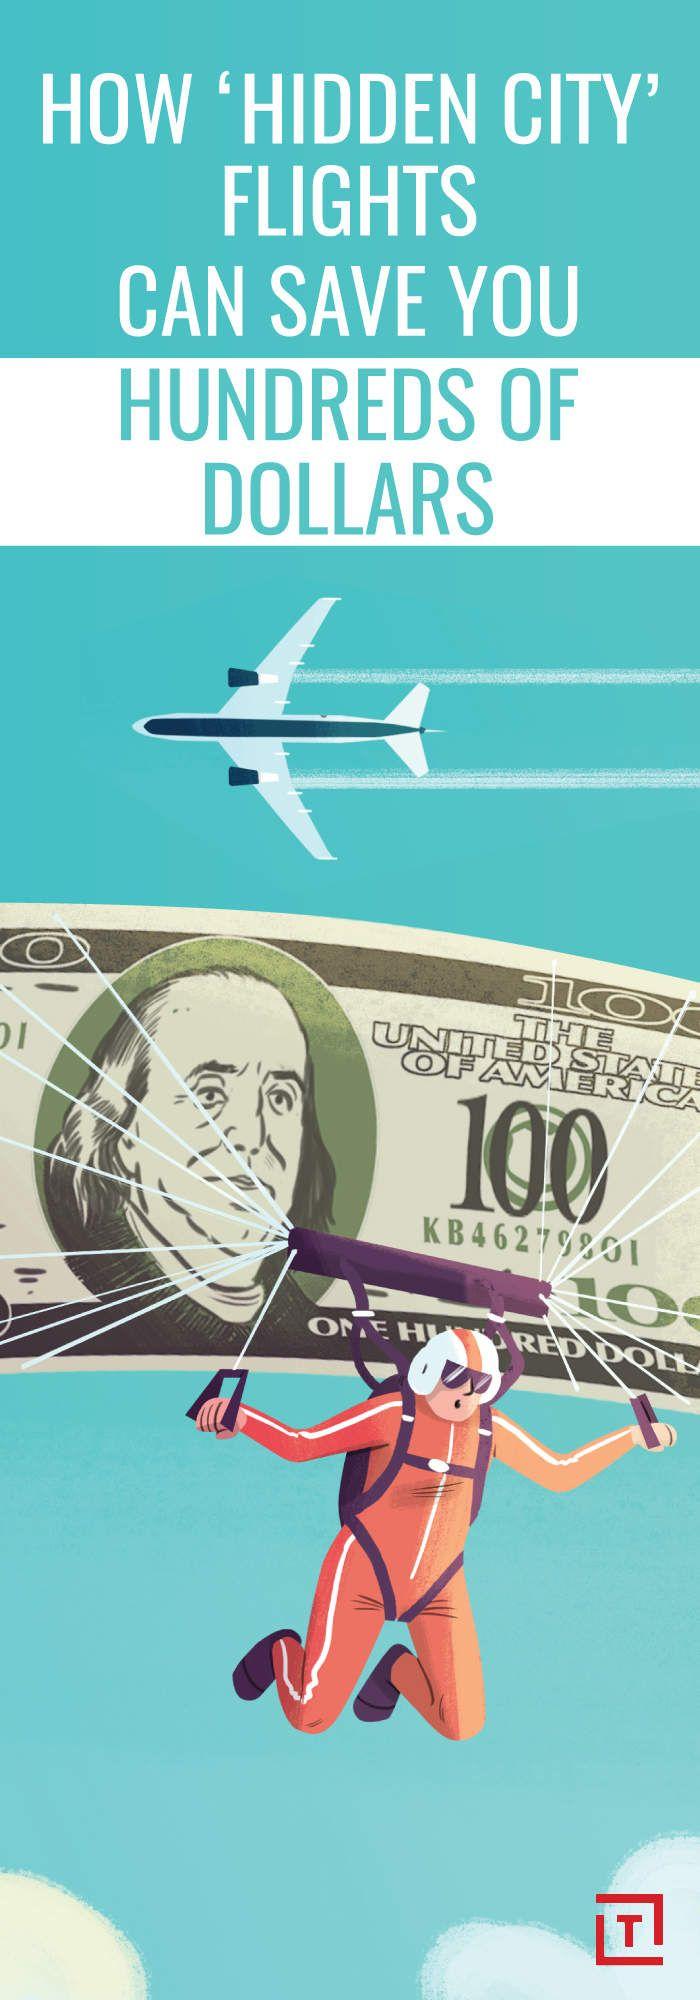 'Hidden City' Flights Will Save You Hundreds of Dollars